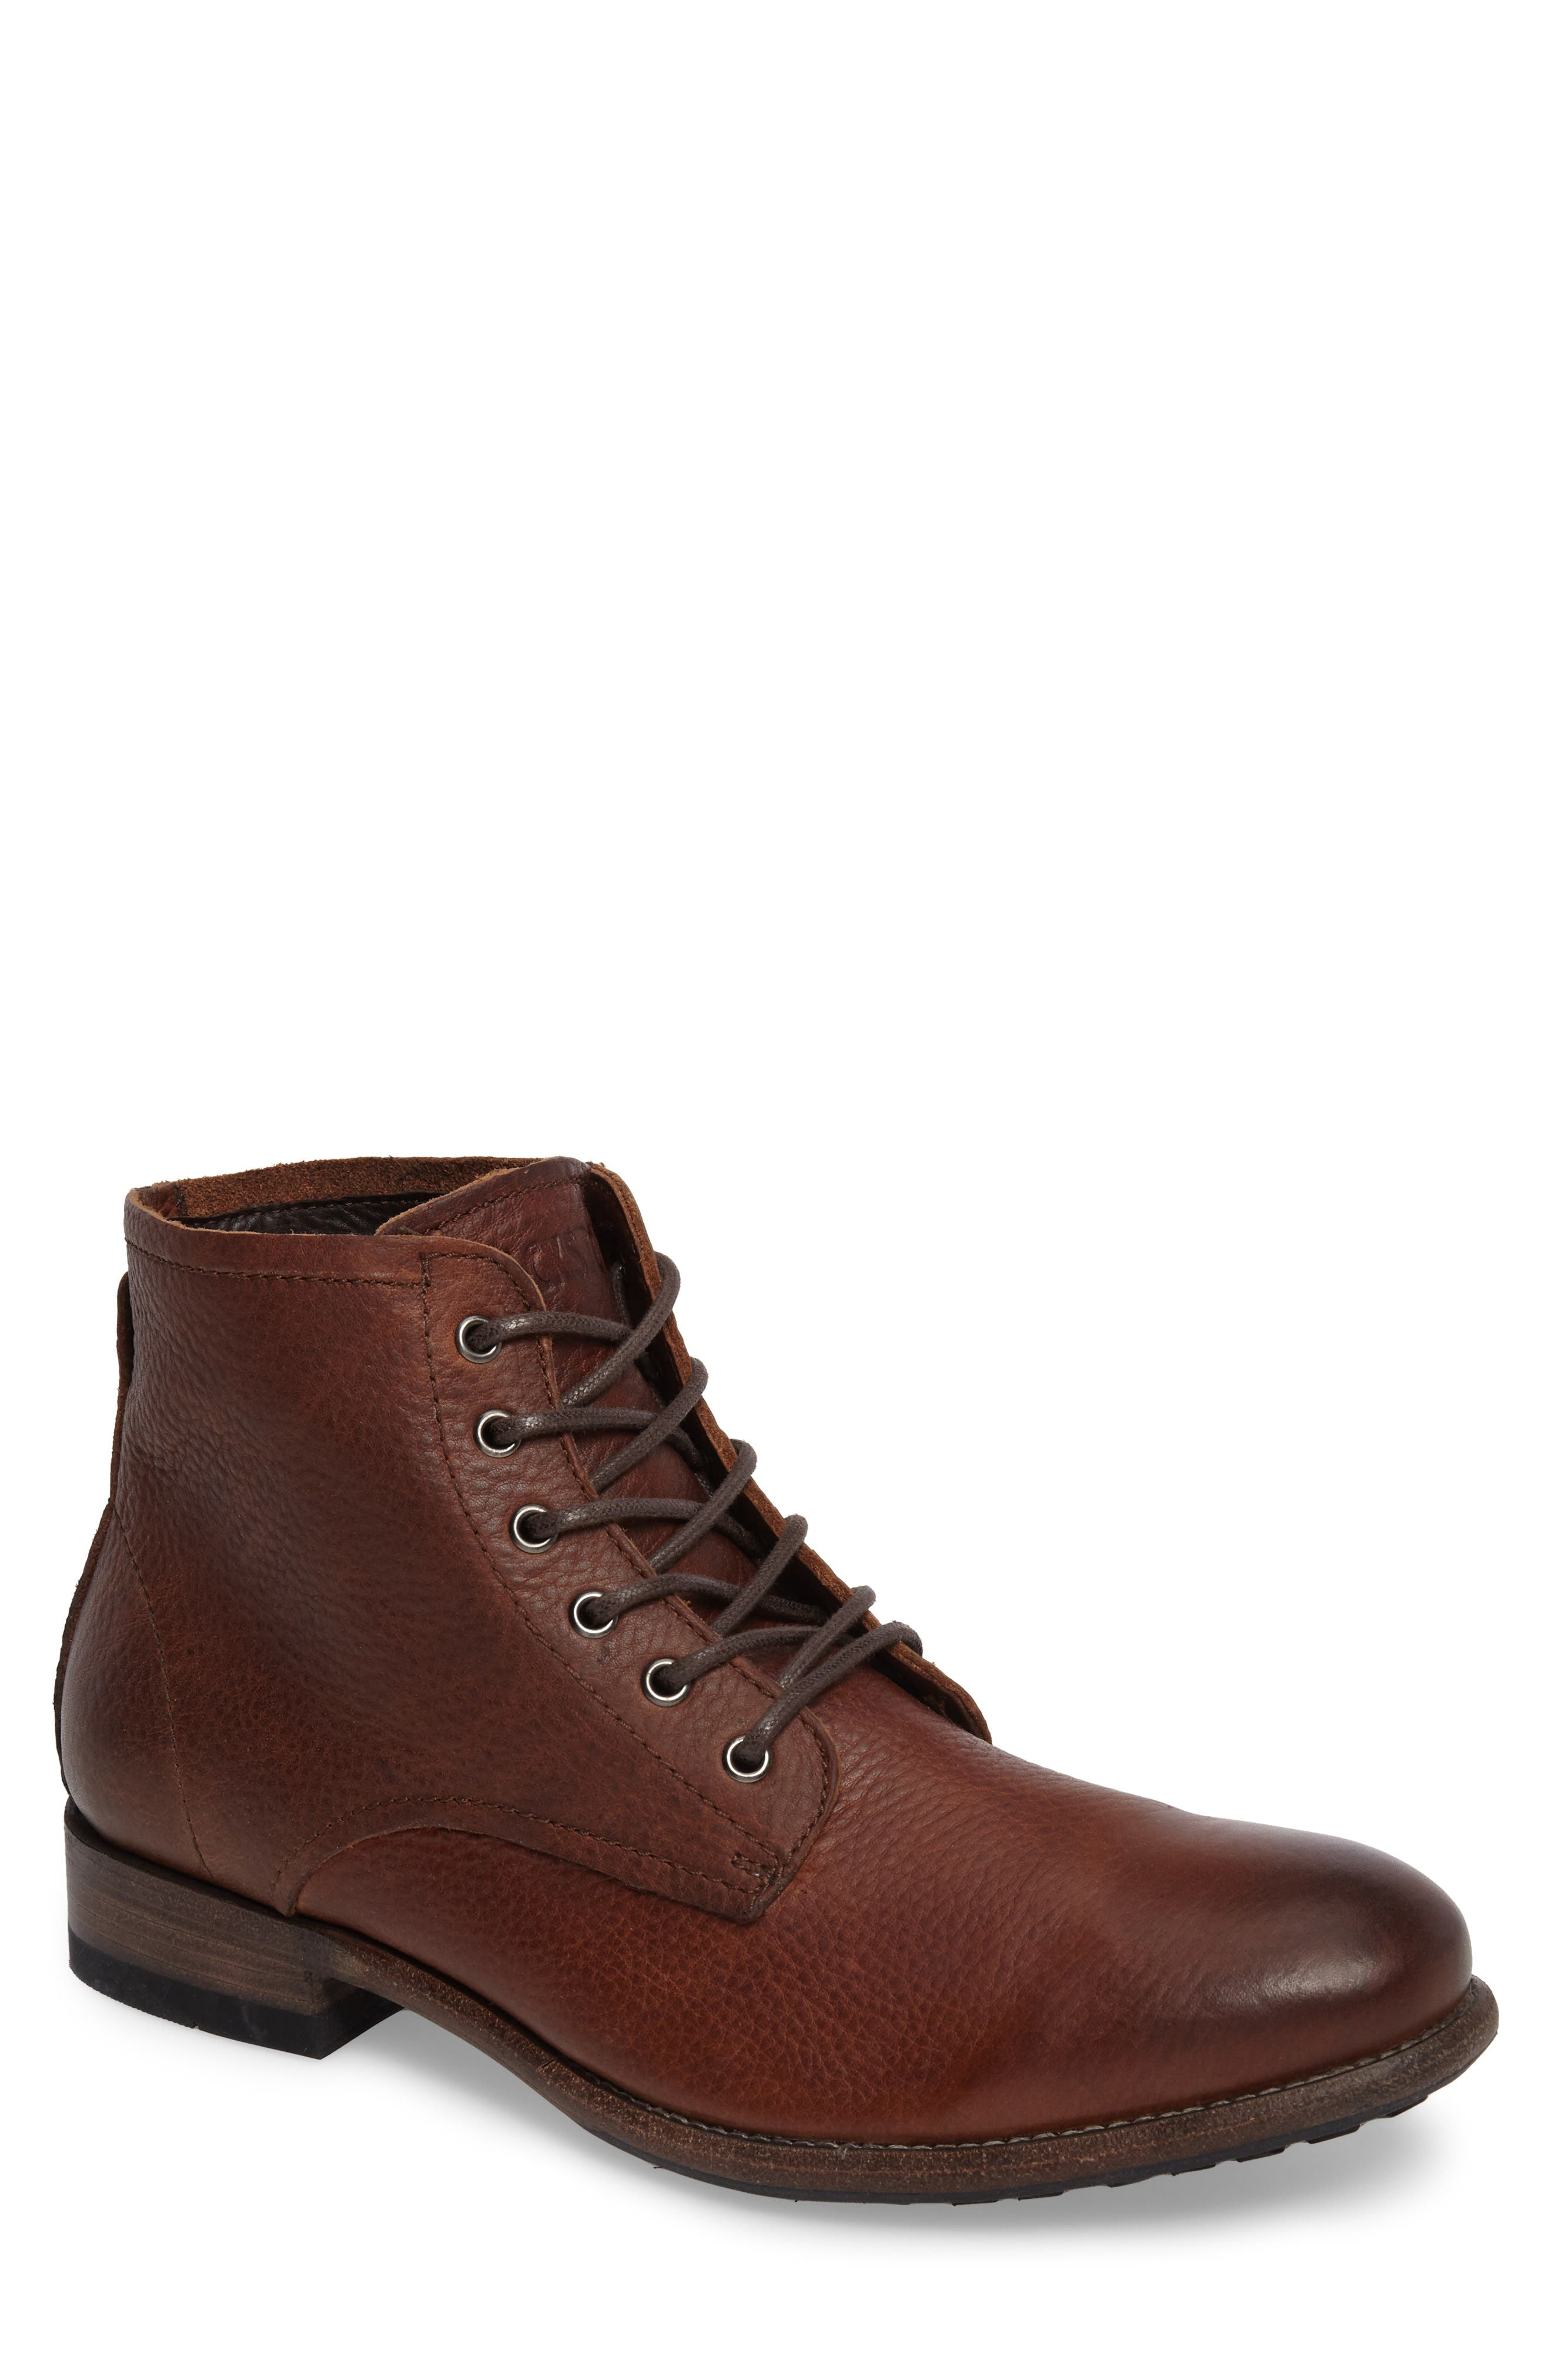 Alternate Image 1 Selected - Blackstone KM 21 Plain Toe Boot (Men)